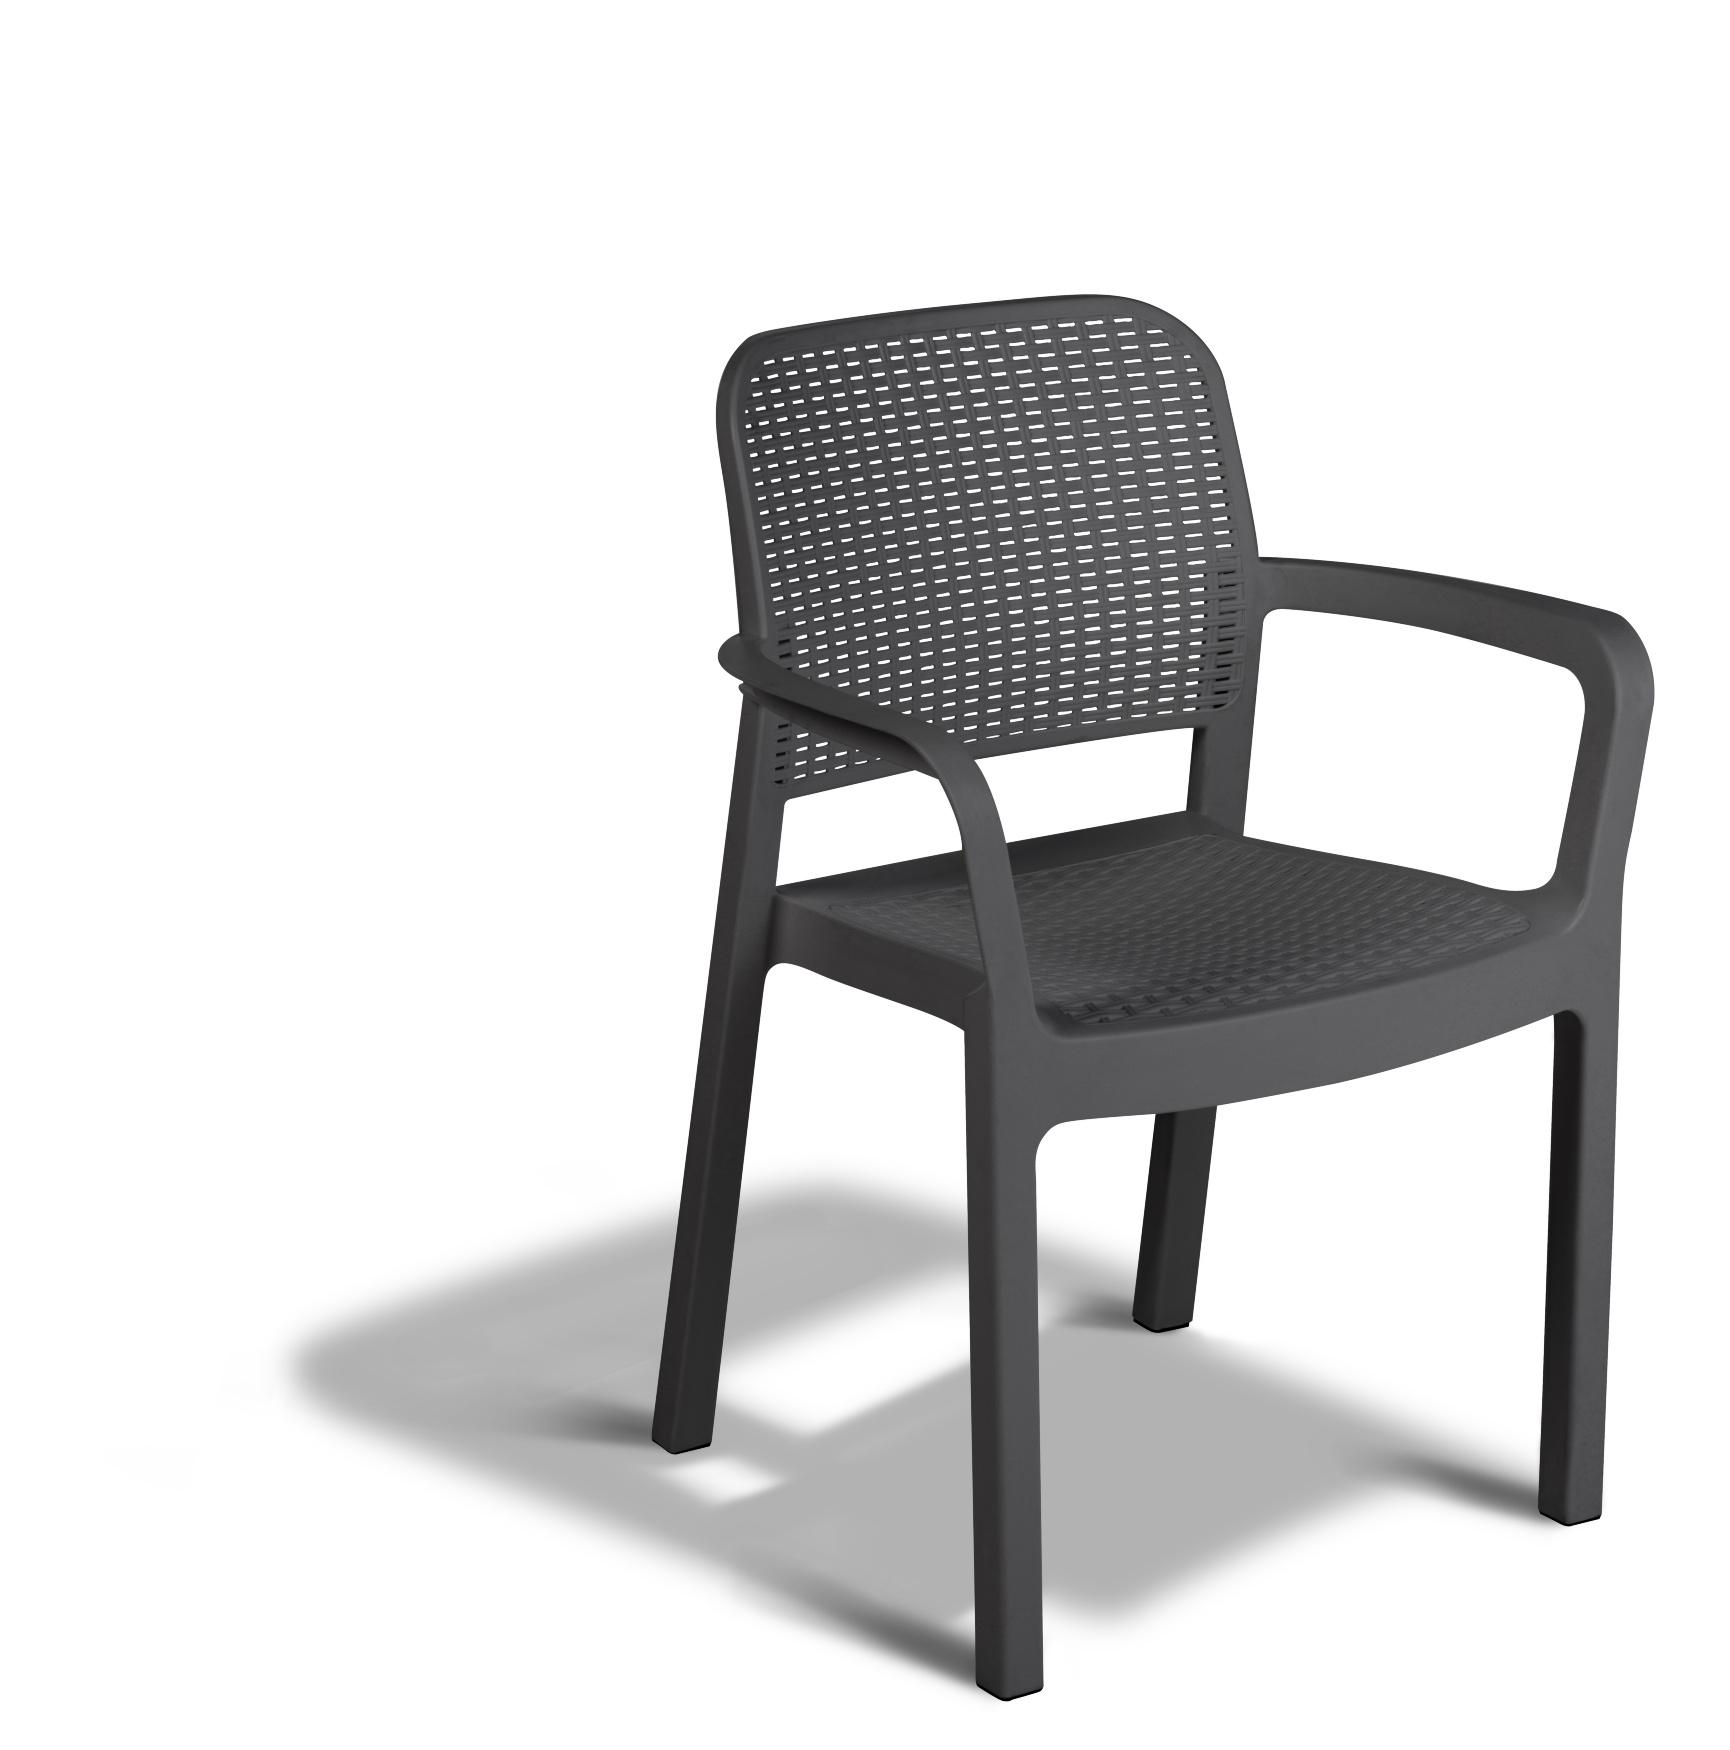 Garden chairs & Garden Seating Allibert